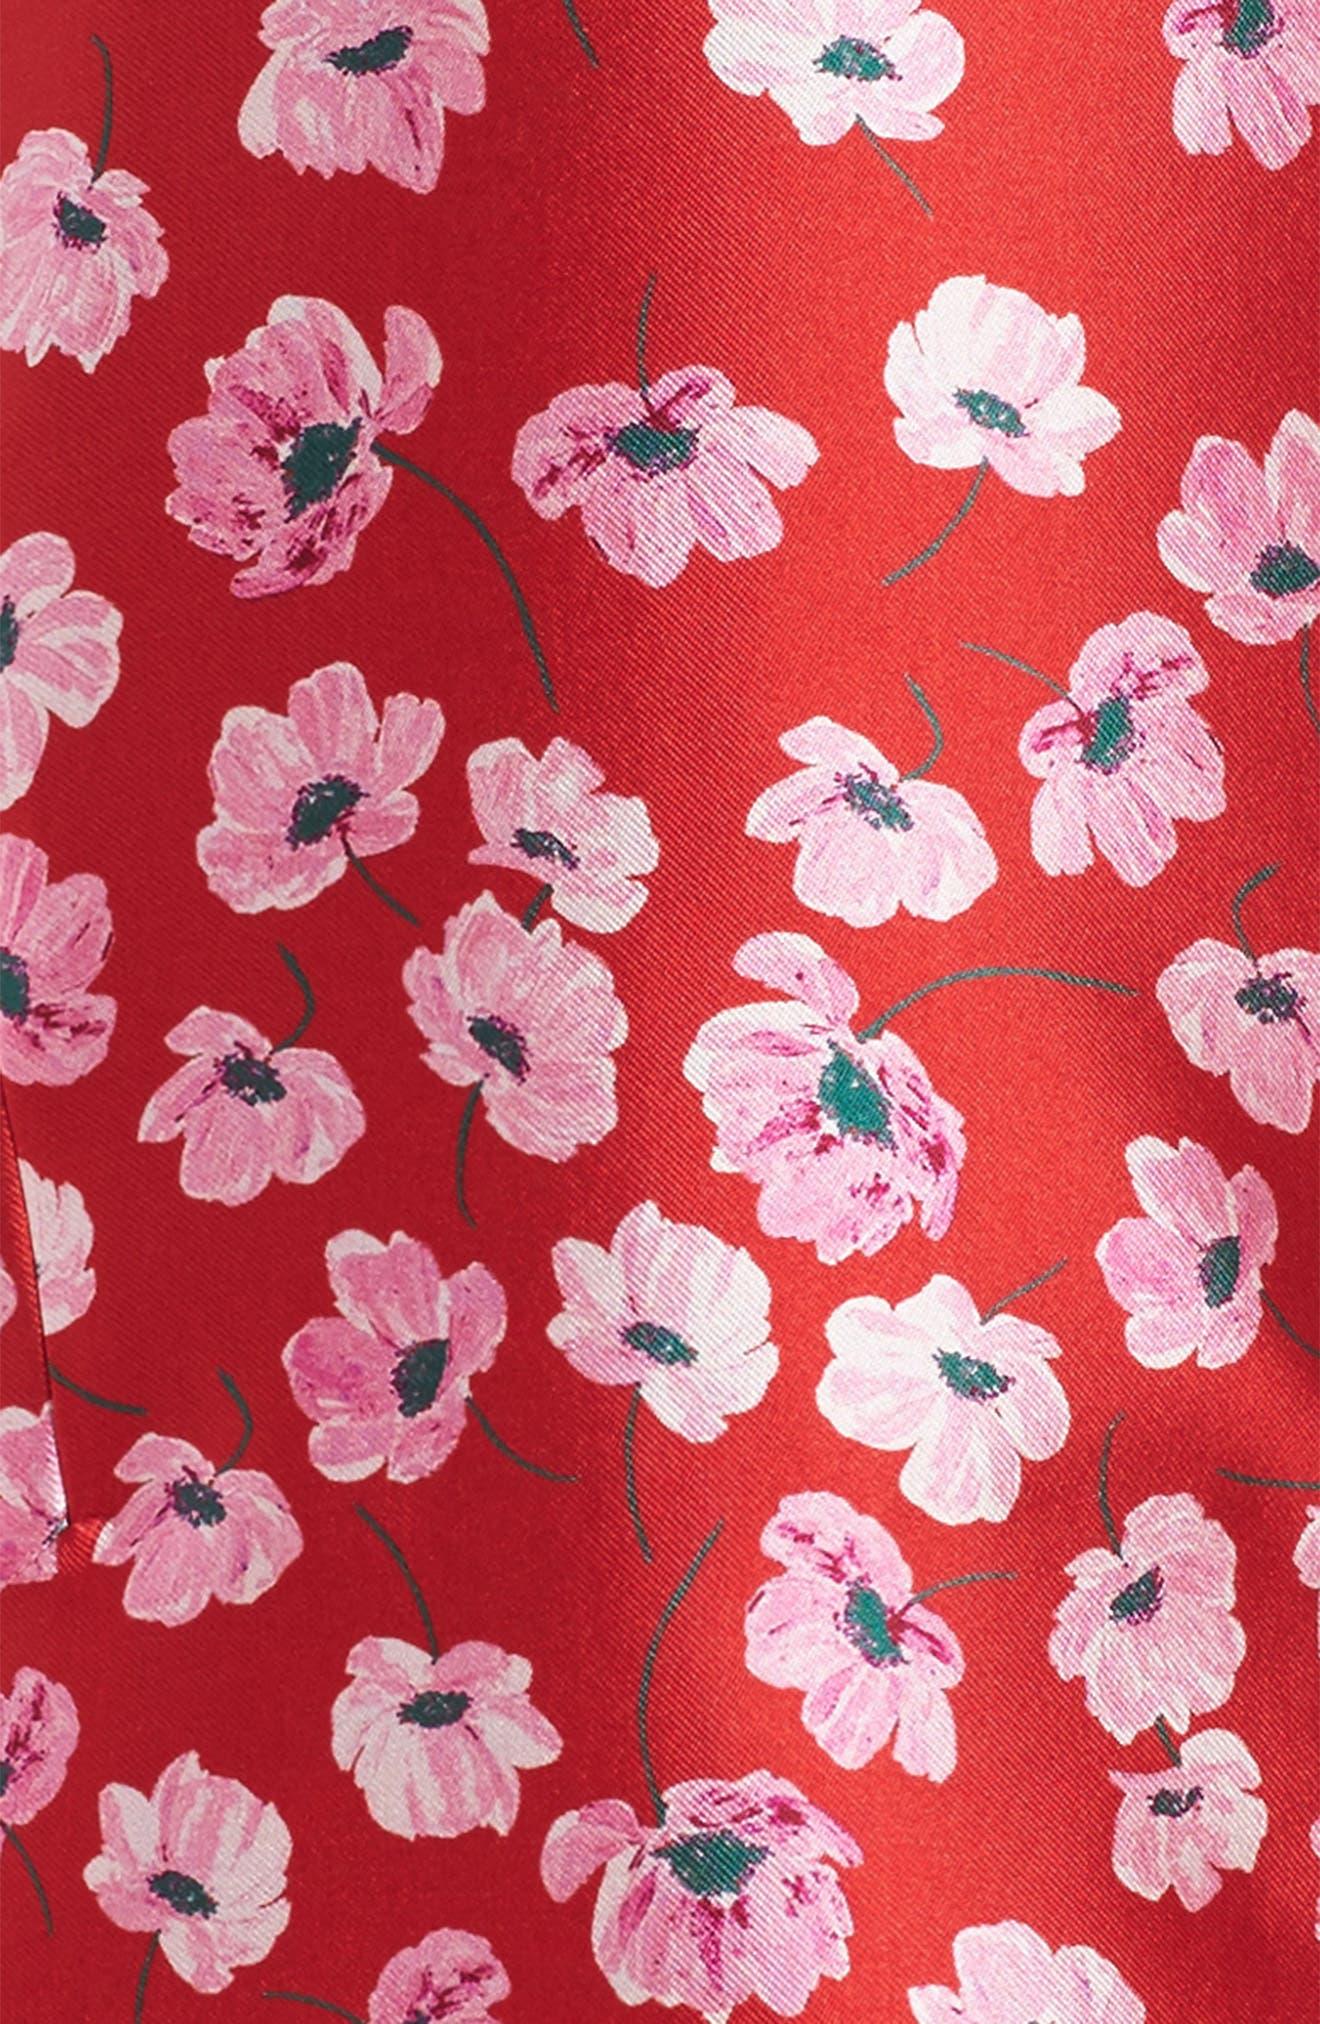 Poppies Mikado Dress,                             Alternate thumbnail 2, color,